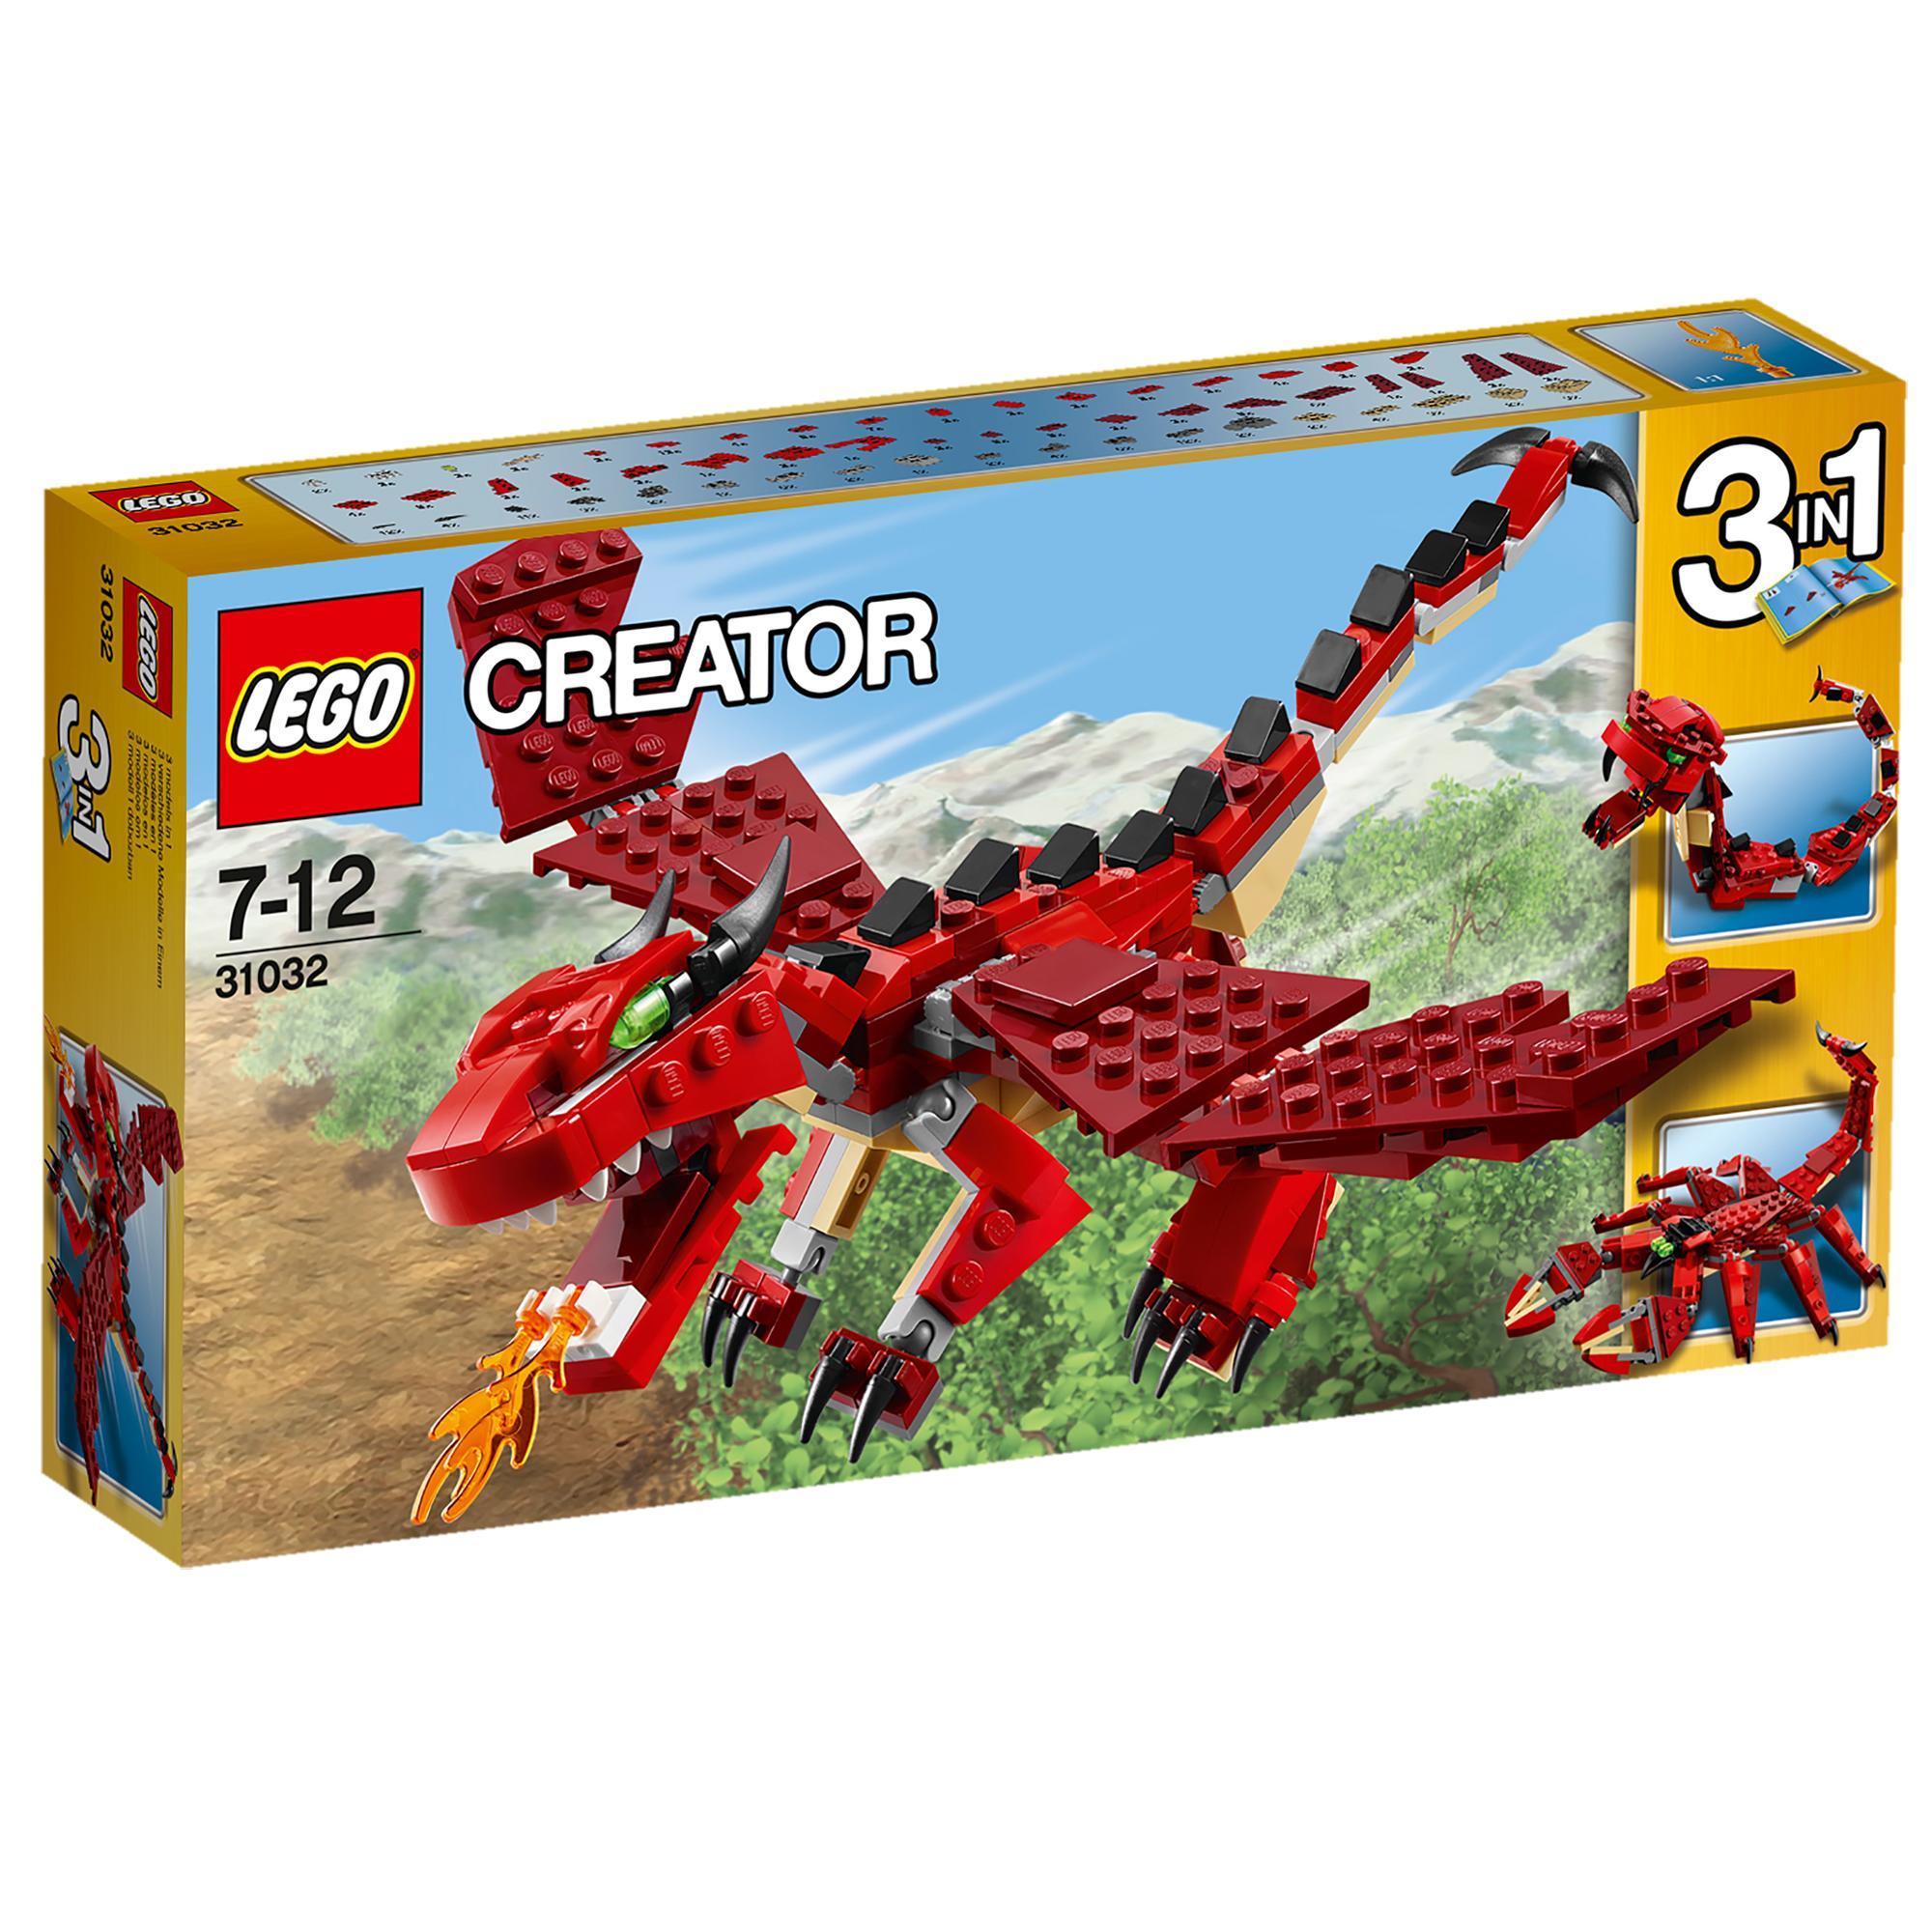 LEGO Creator 31032 pas cher